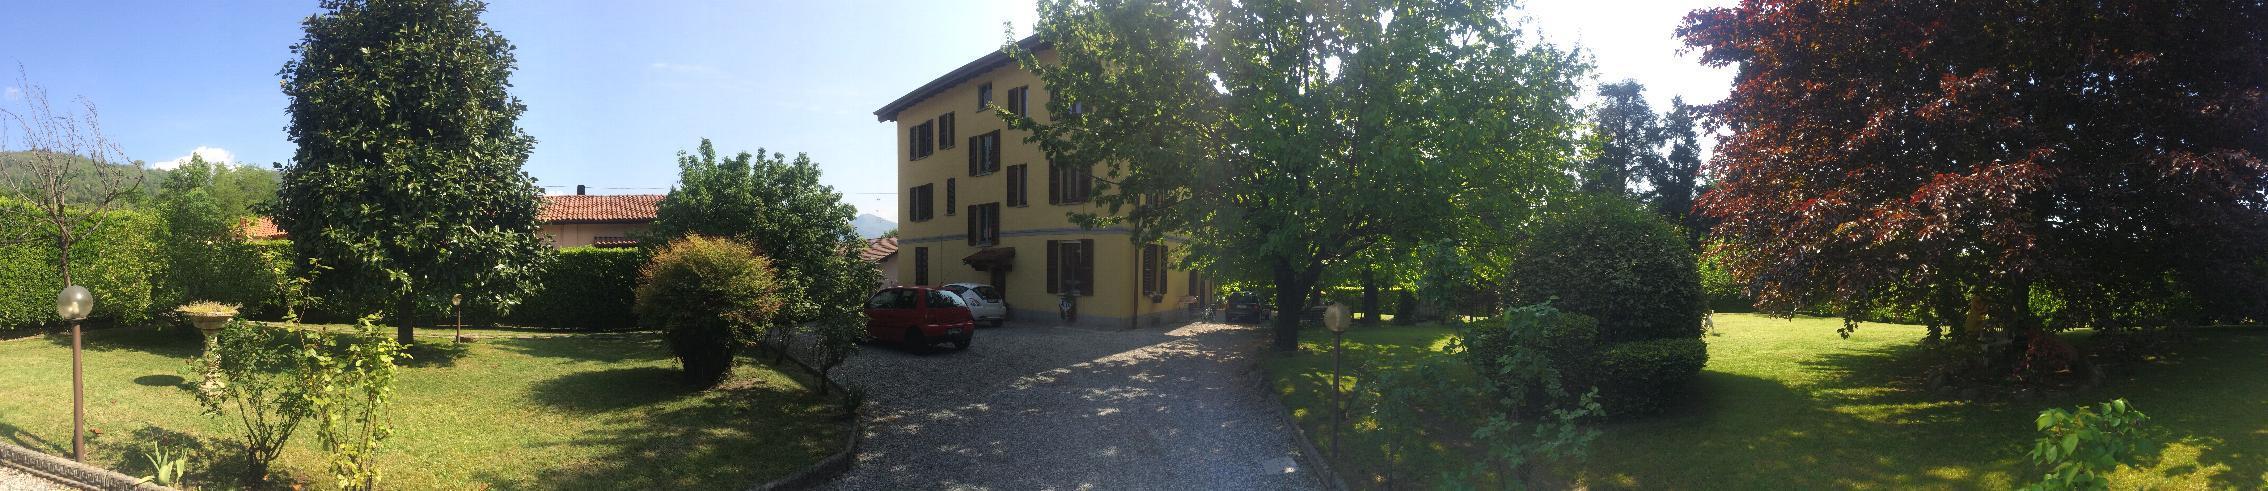 Casa indipendente in Vendita a Erba: 5 locali, 600 mq